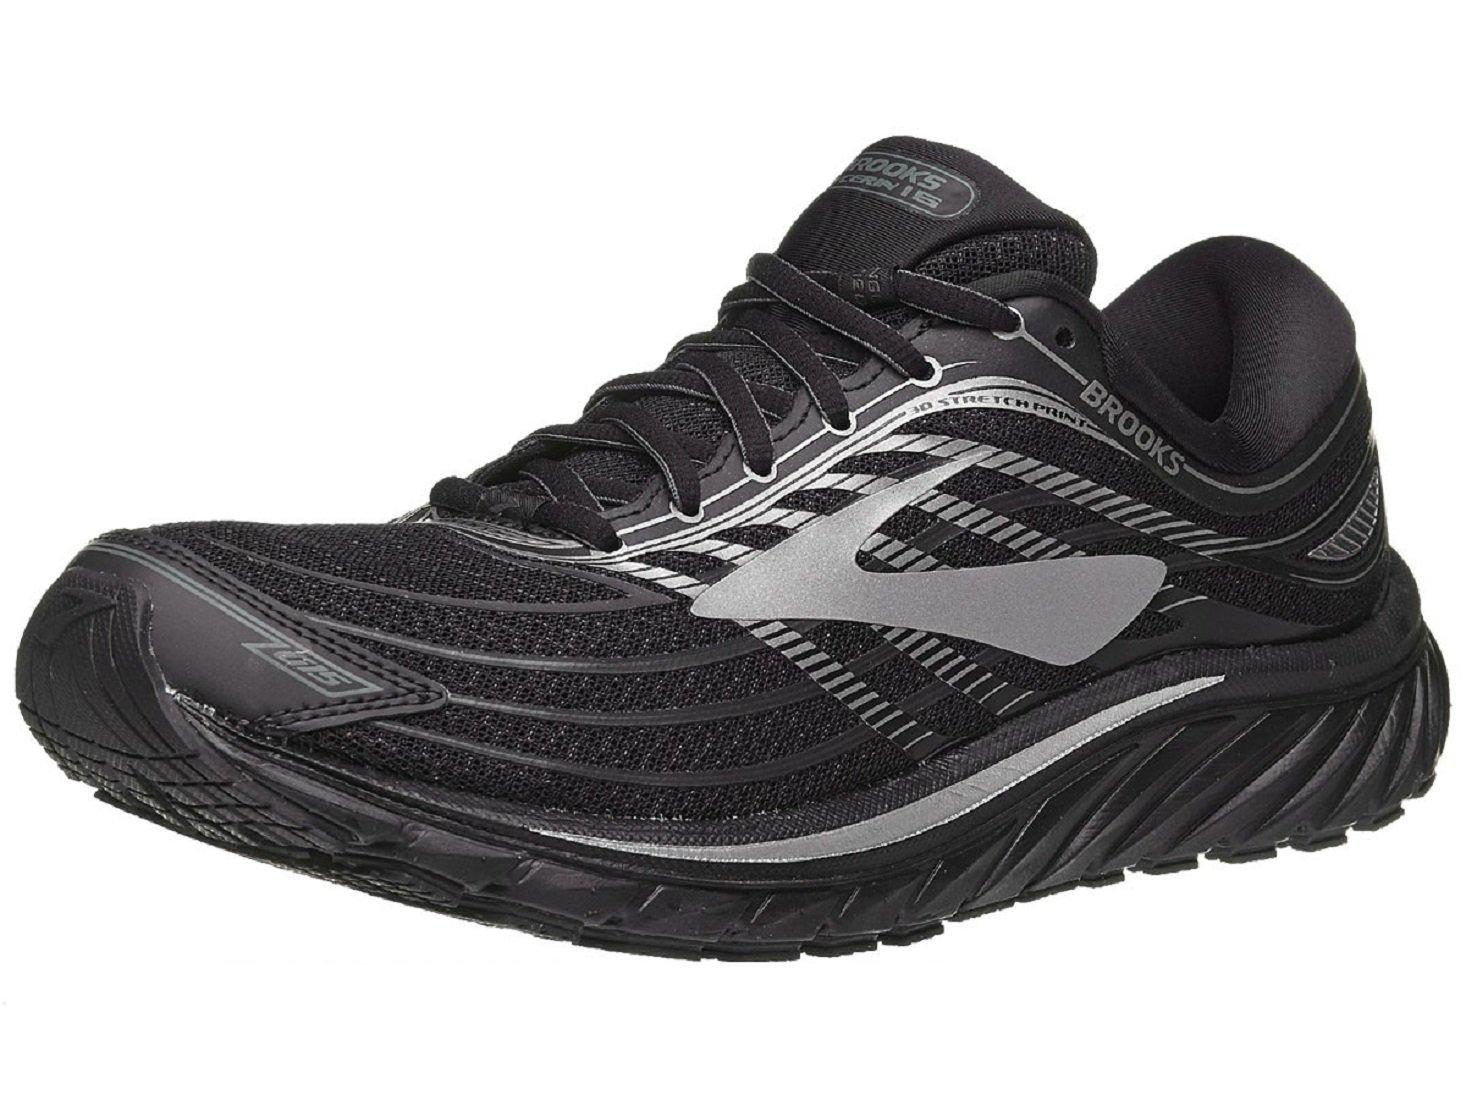 Brooks Mens Glycerin 15 Neutral Maximum Cushion Running Shoe B06XPW3VGG 14 D(M) US|Black/Silver/Grey